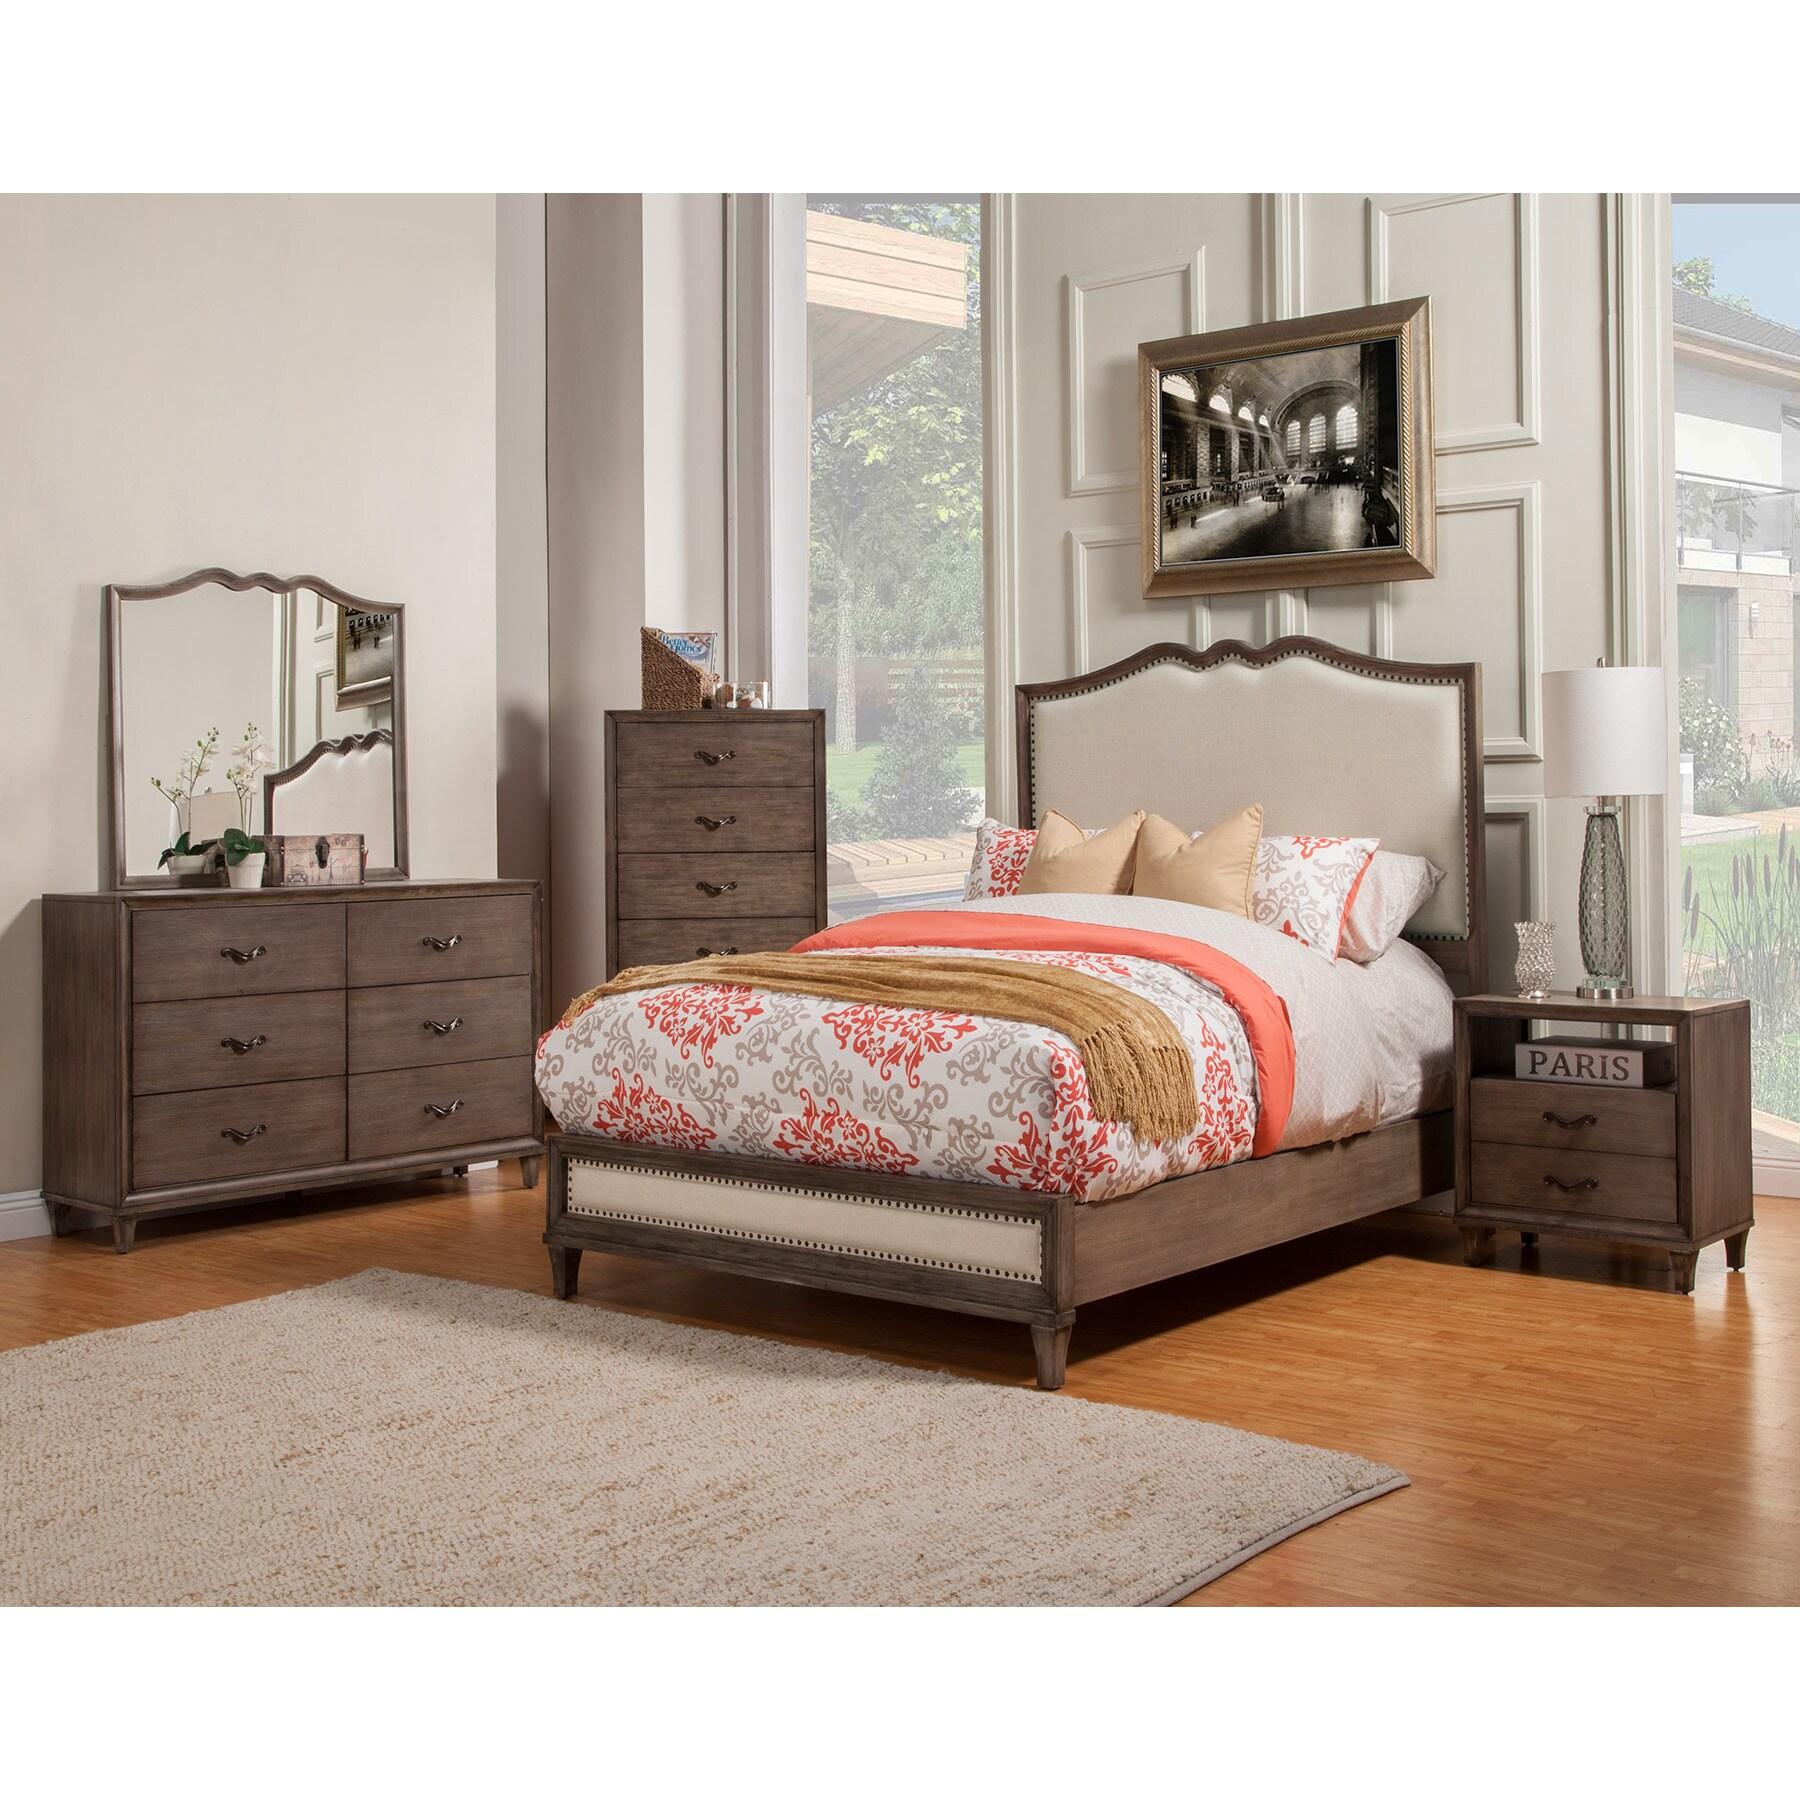 Alpine Furniture Alpine Charlston Panel Bed with Upholste...